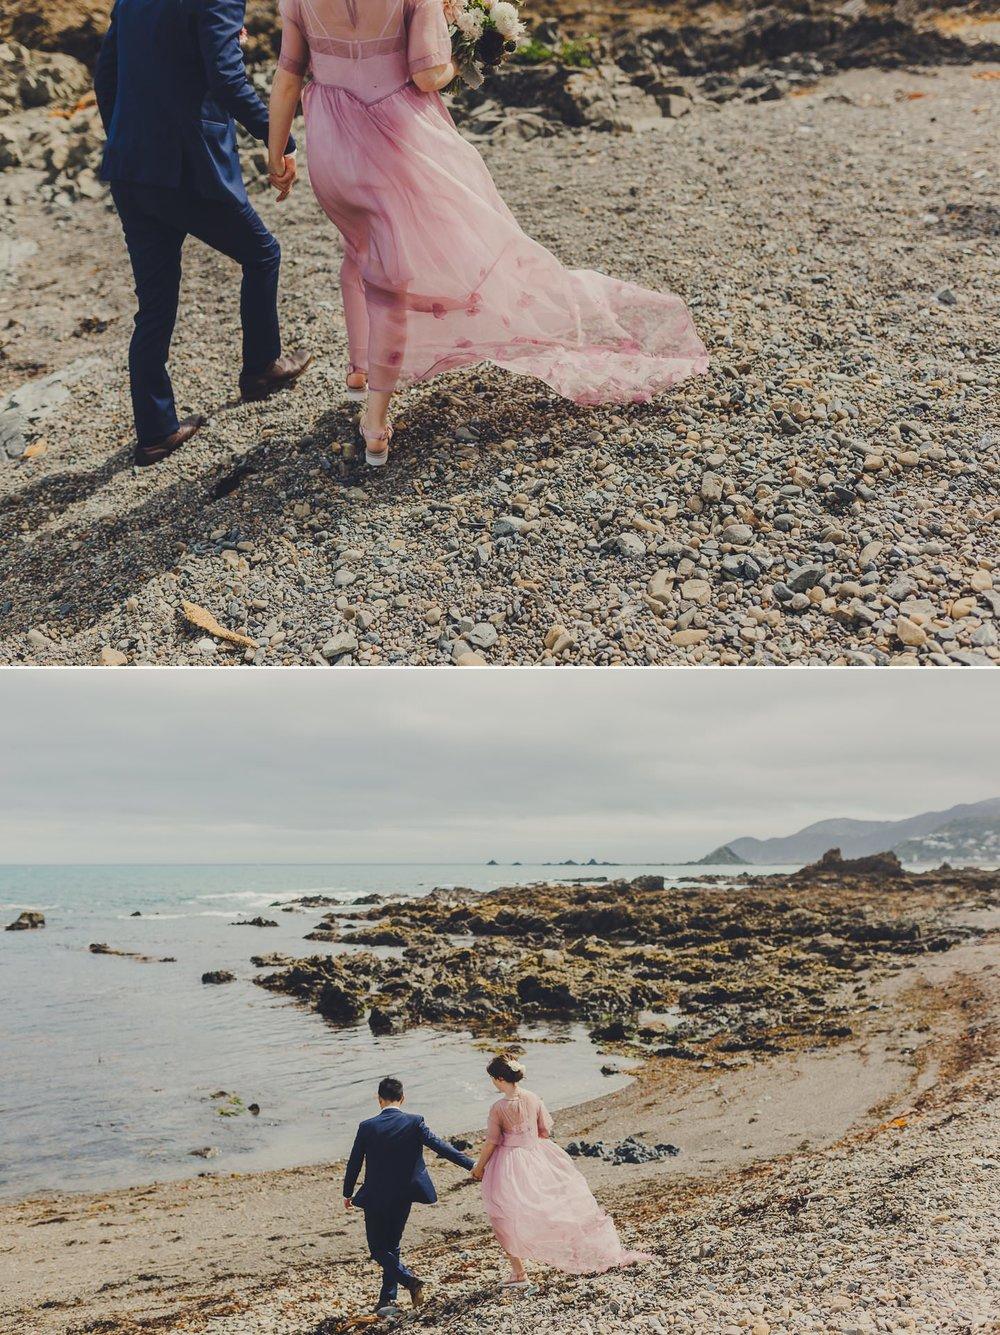 Wellington south coast seaside wedding